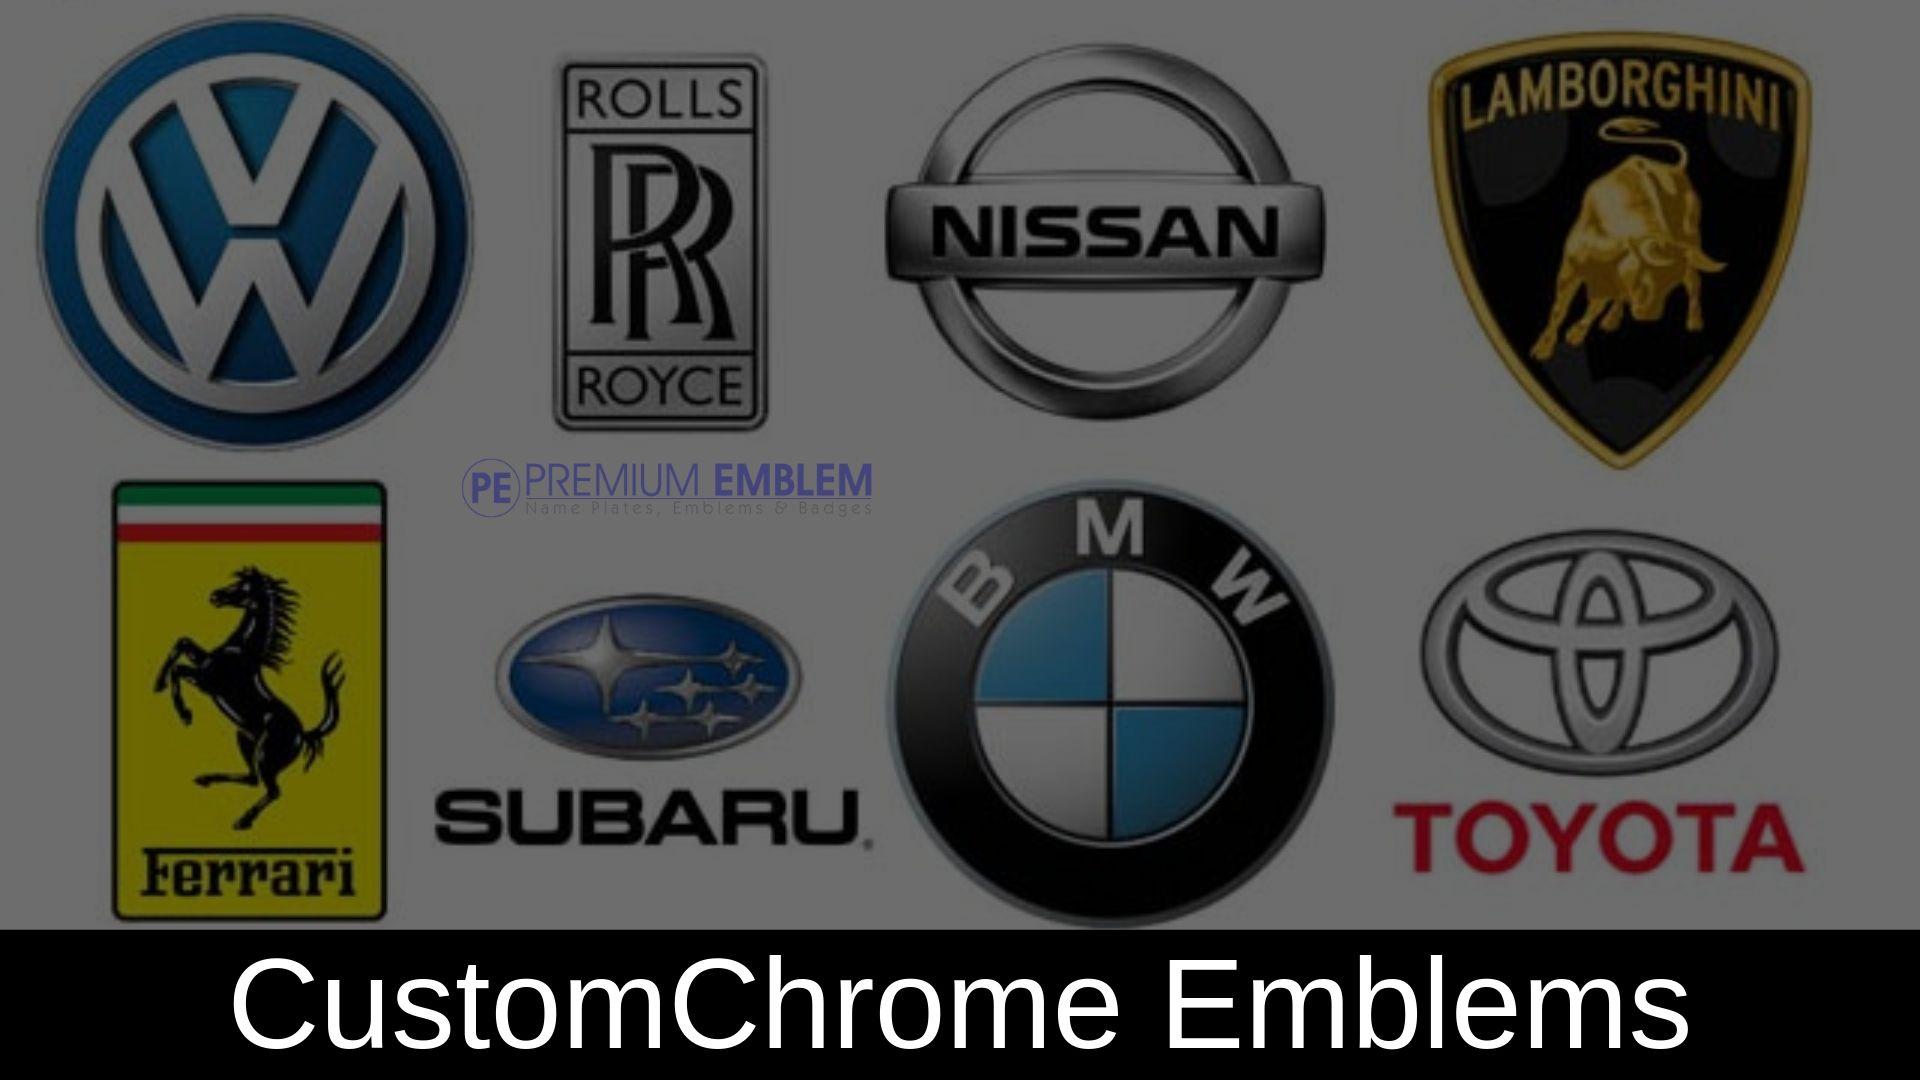 Should A Car Dealership Get Custom Chrome Emblems For Its Brand Custom Car Emblems Emblems Car Dealership